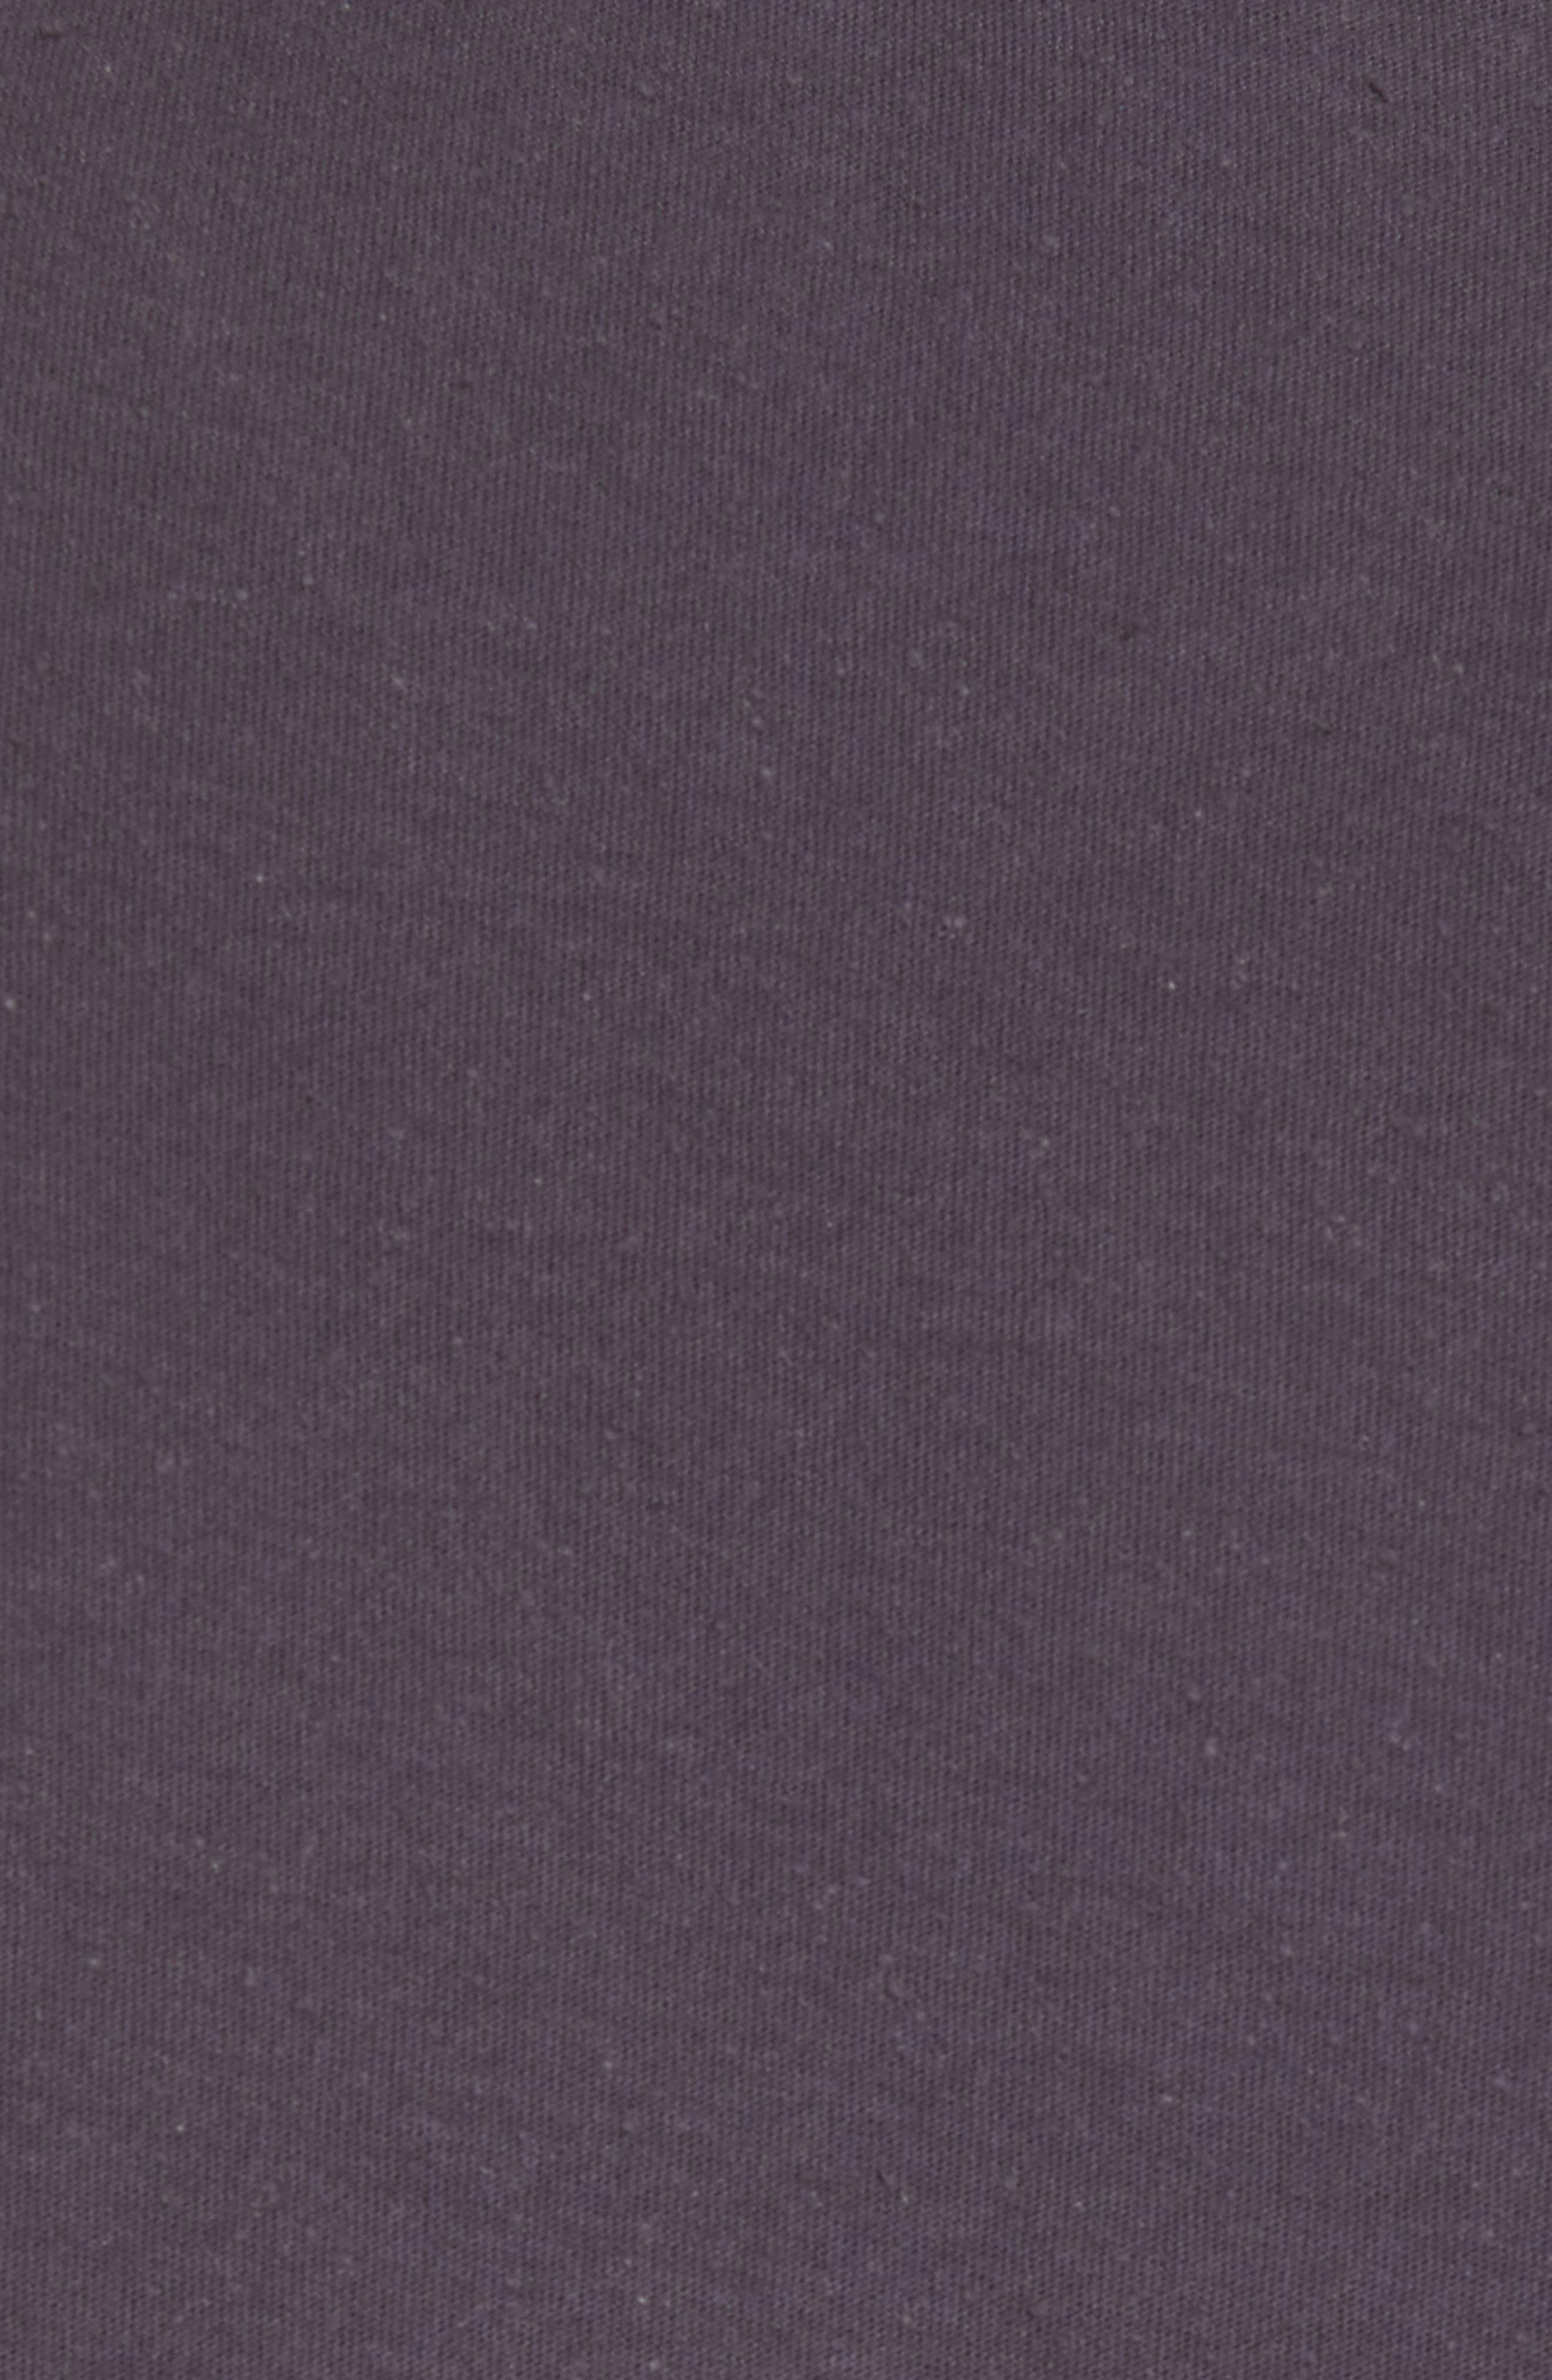 Nep Crewneck T-Shirt,                             Alternate thumbnail 5, color,                             Grey Stonehenge